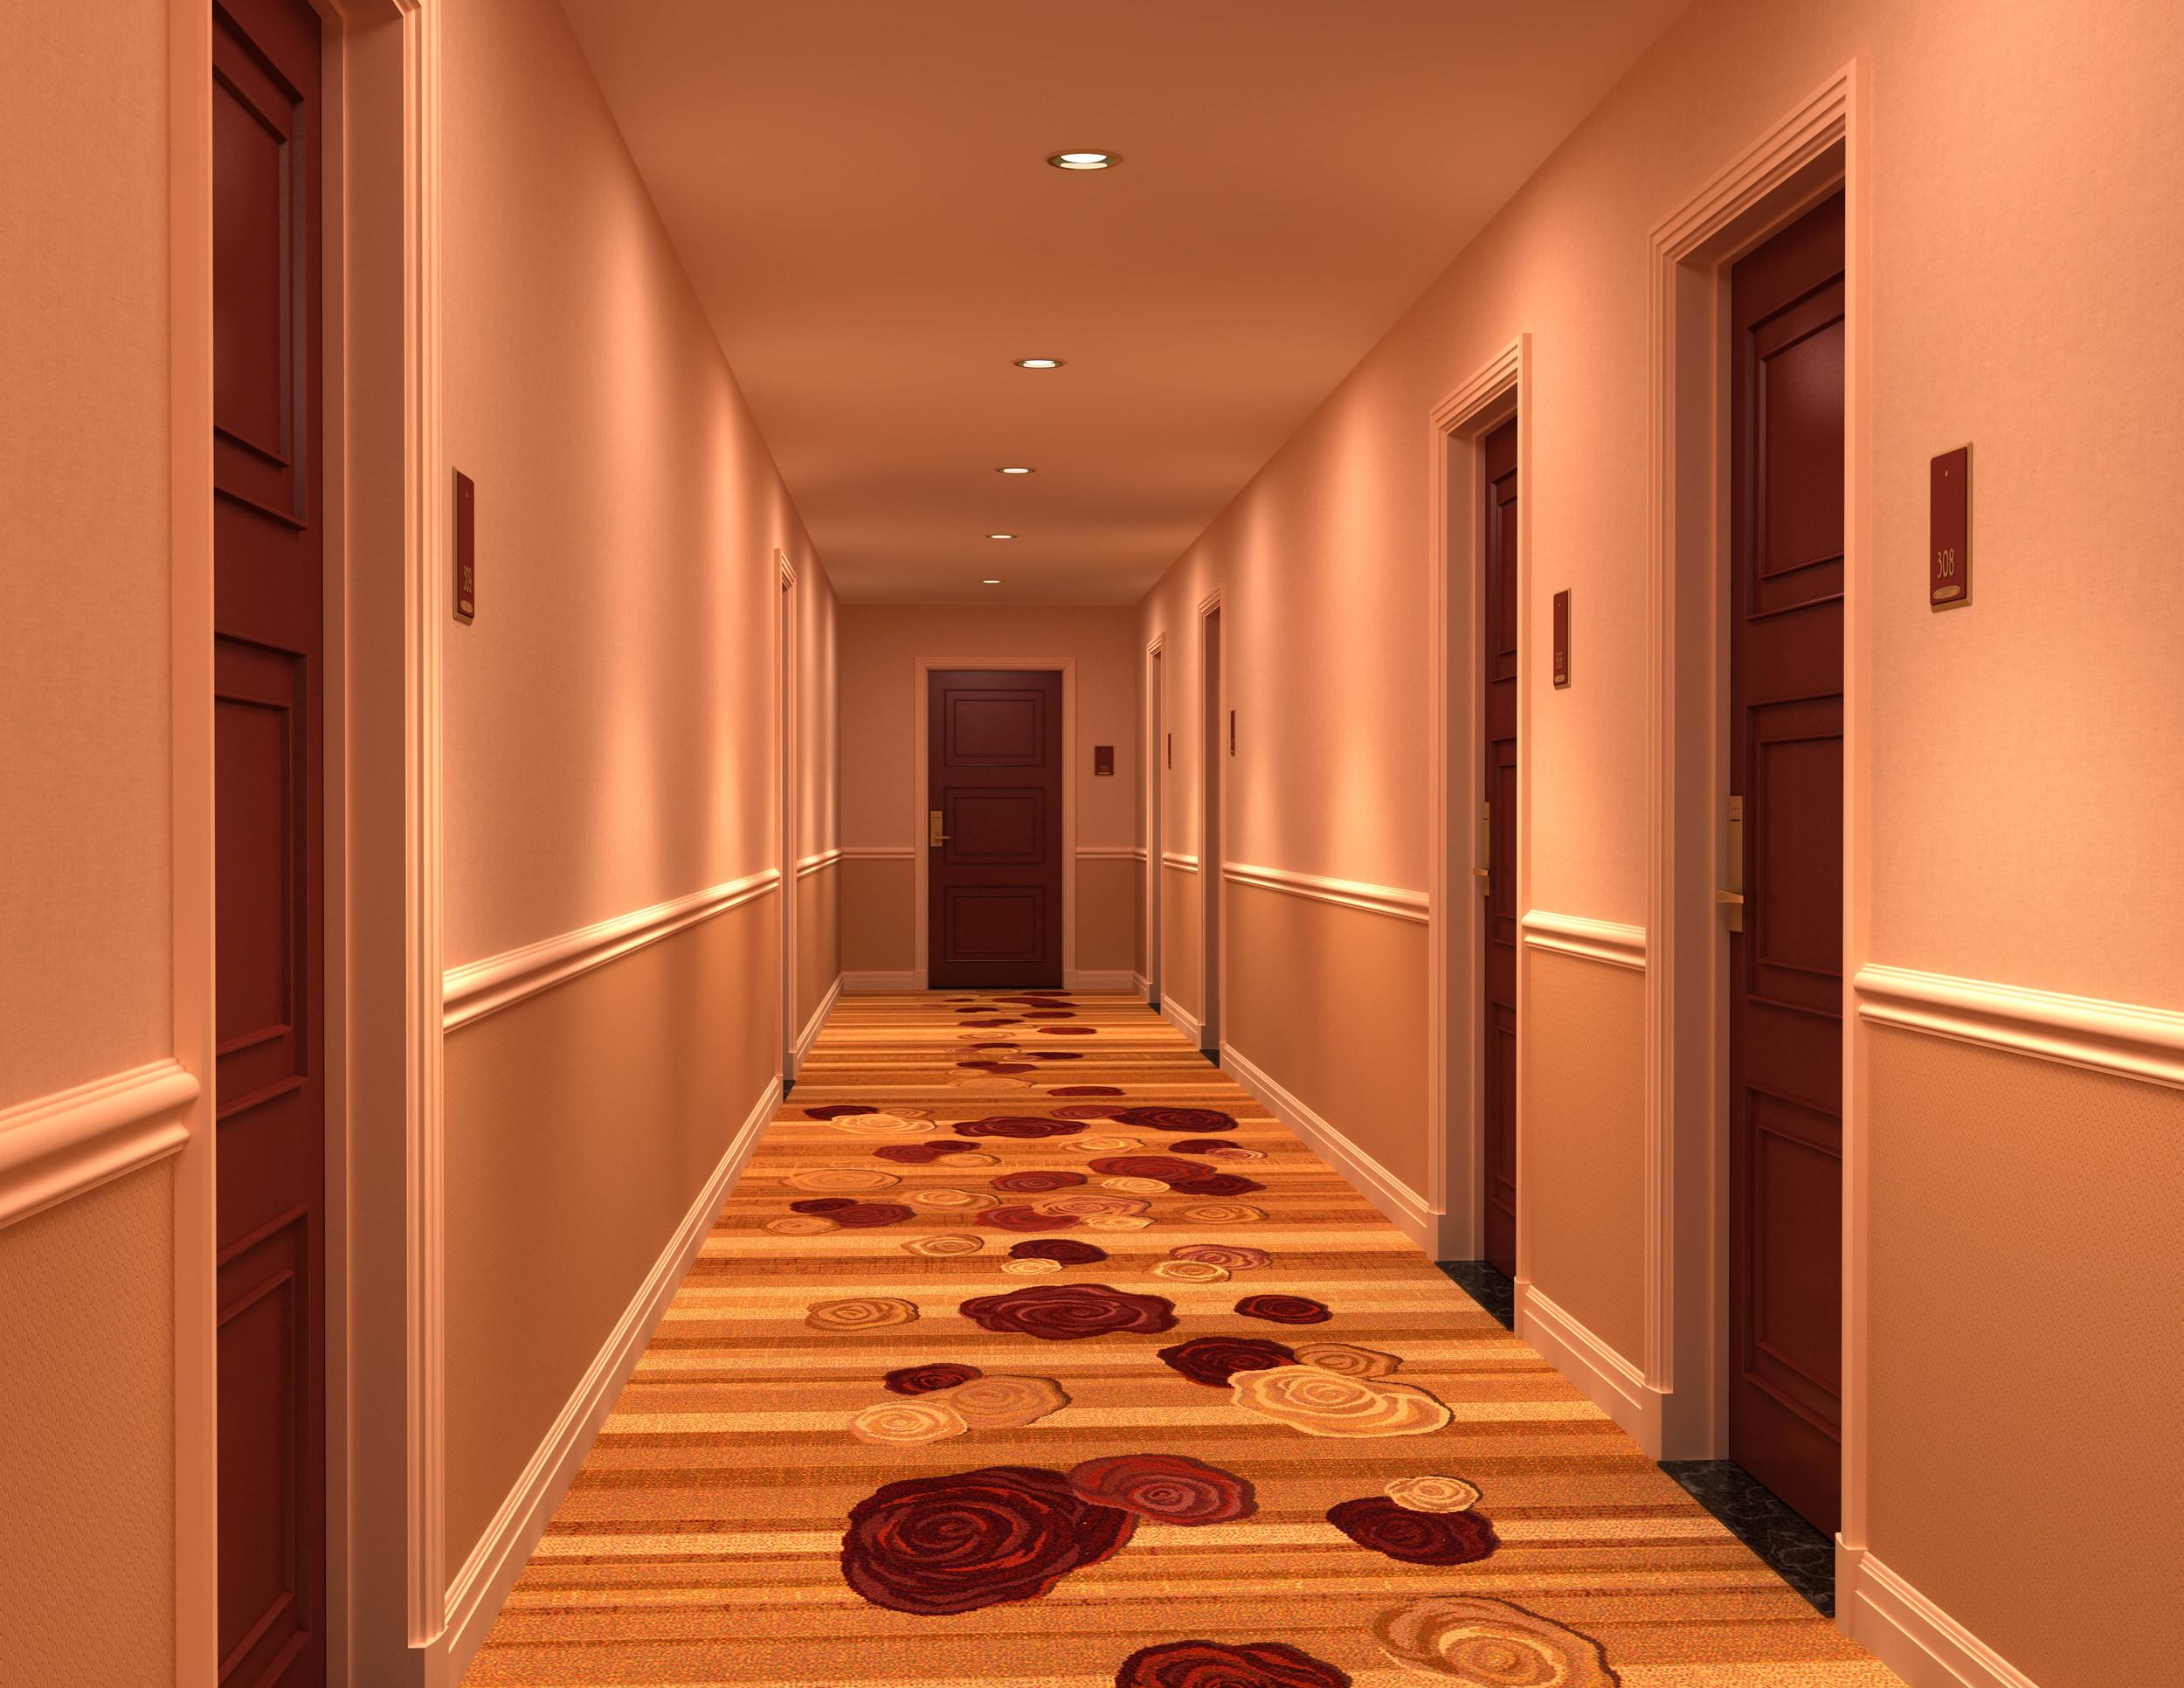 TypicalCorridorFinalPrint.jpg